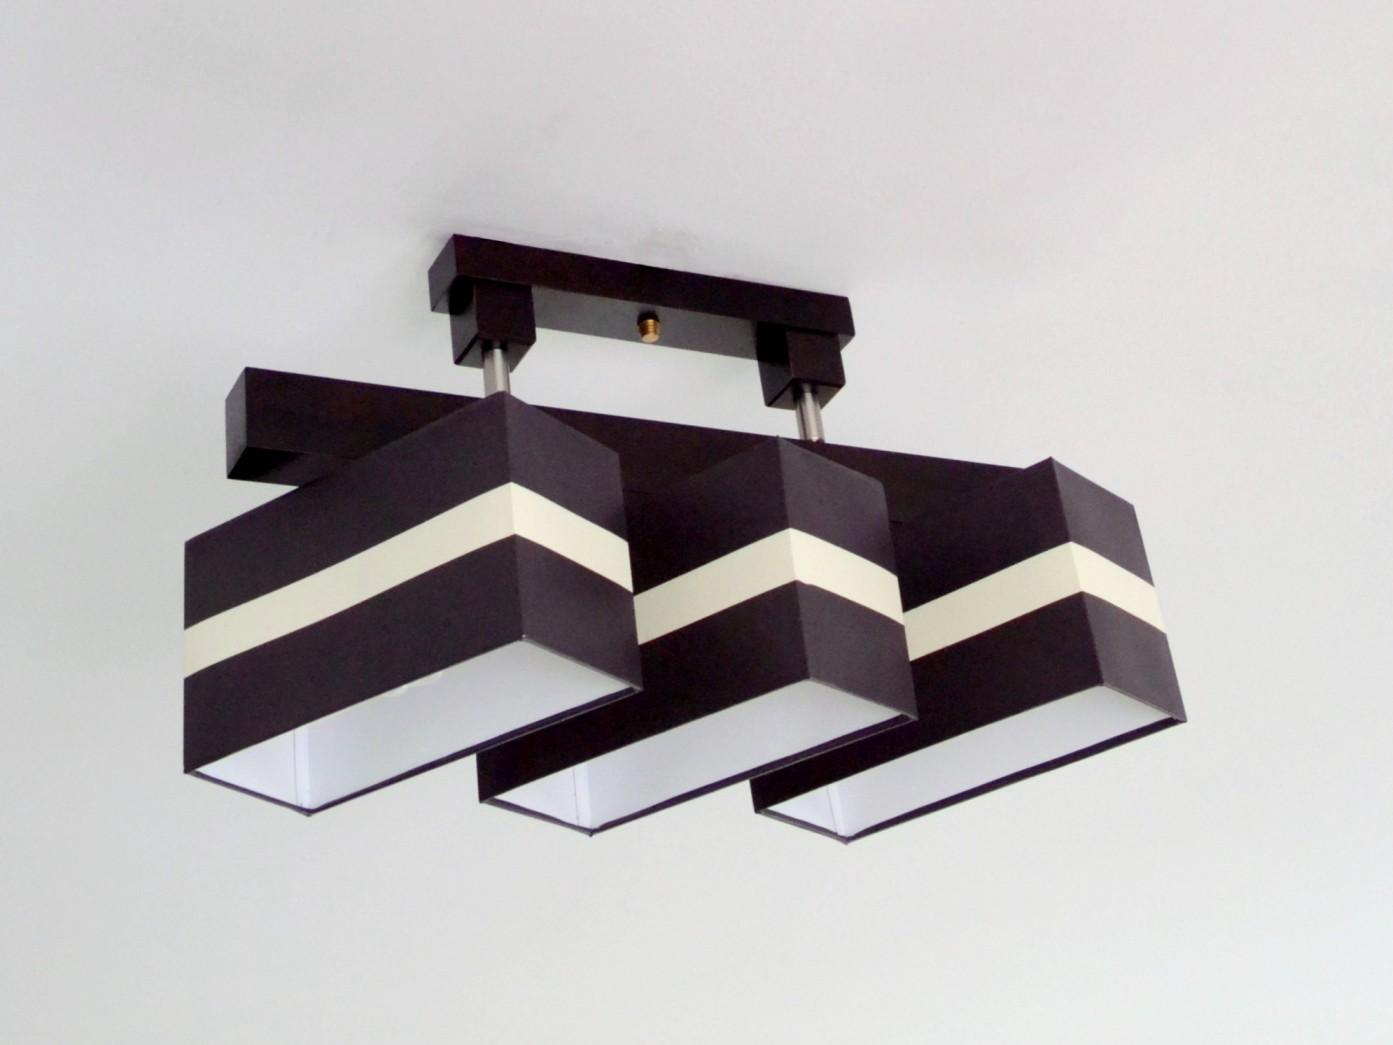 deckenlampe deckenleuchte mallorca v3d neu designer lampe. Black Bedroom Furniture Sets. Home Design Ideas